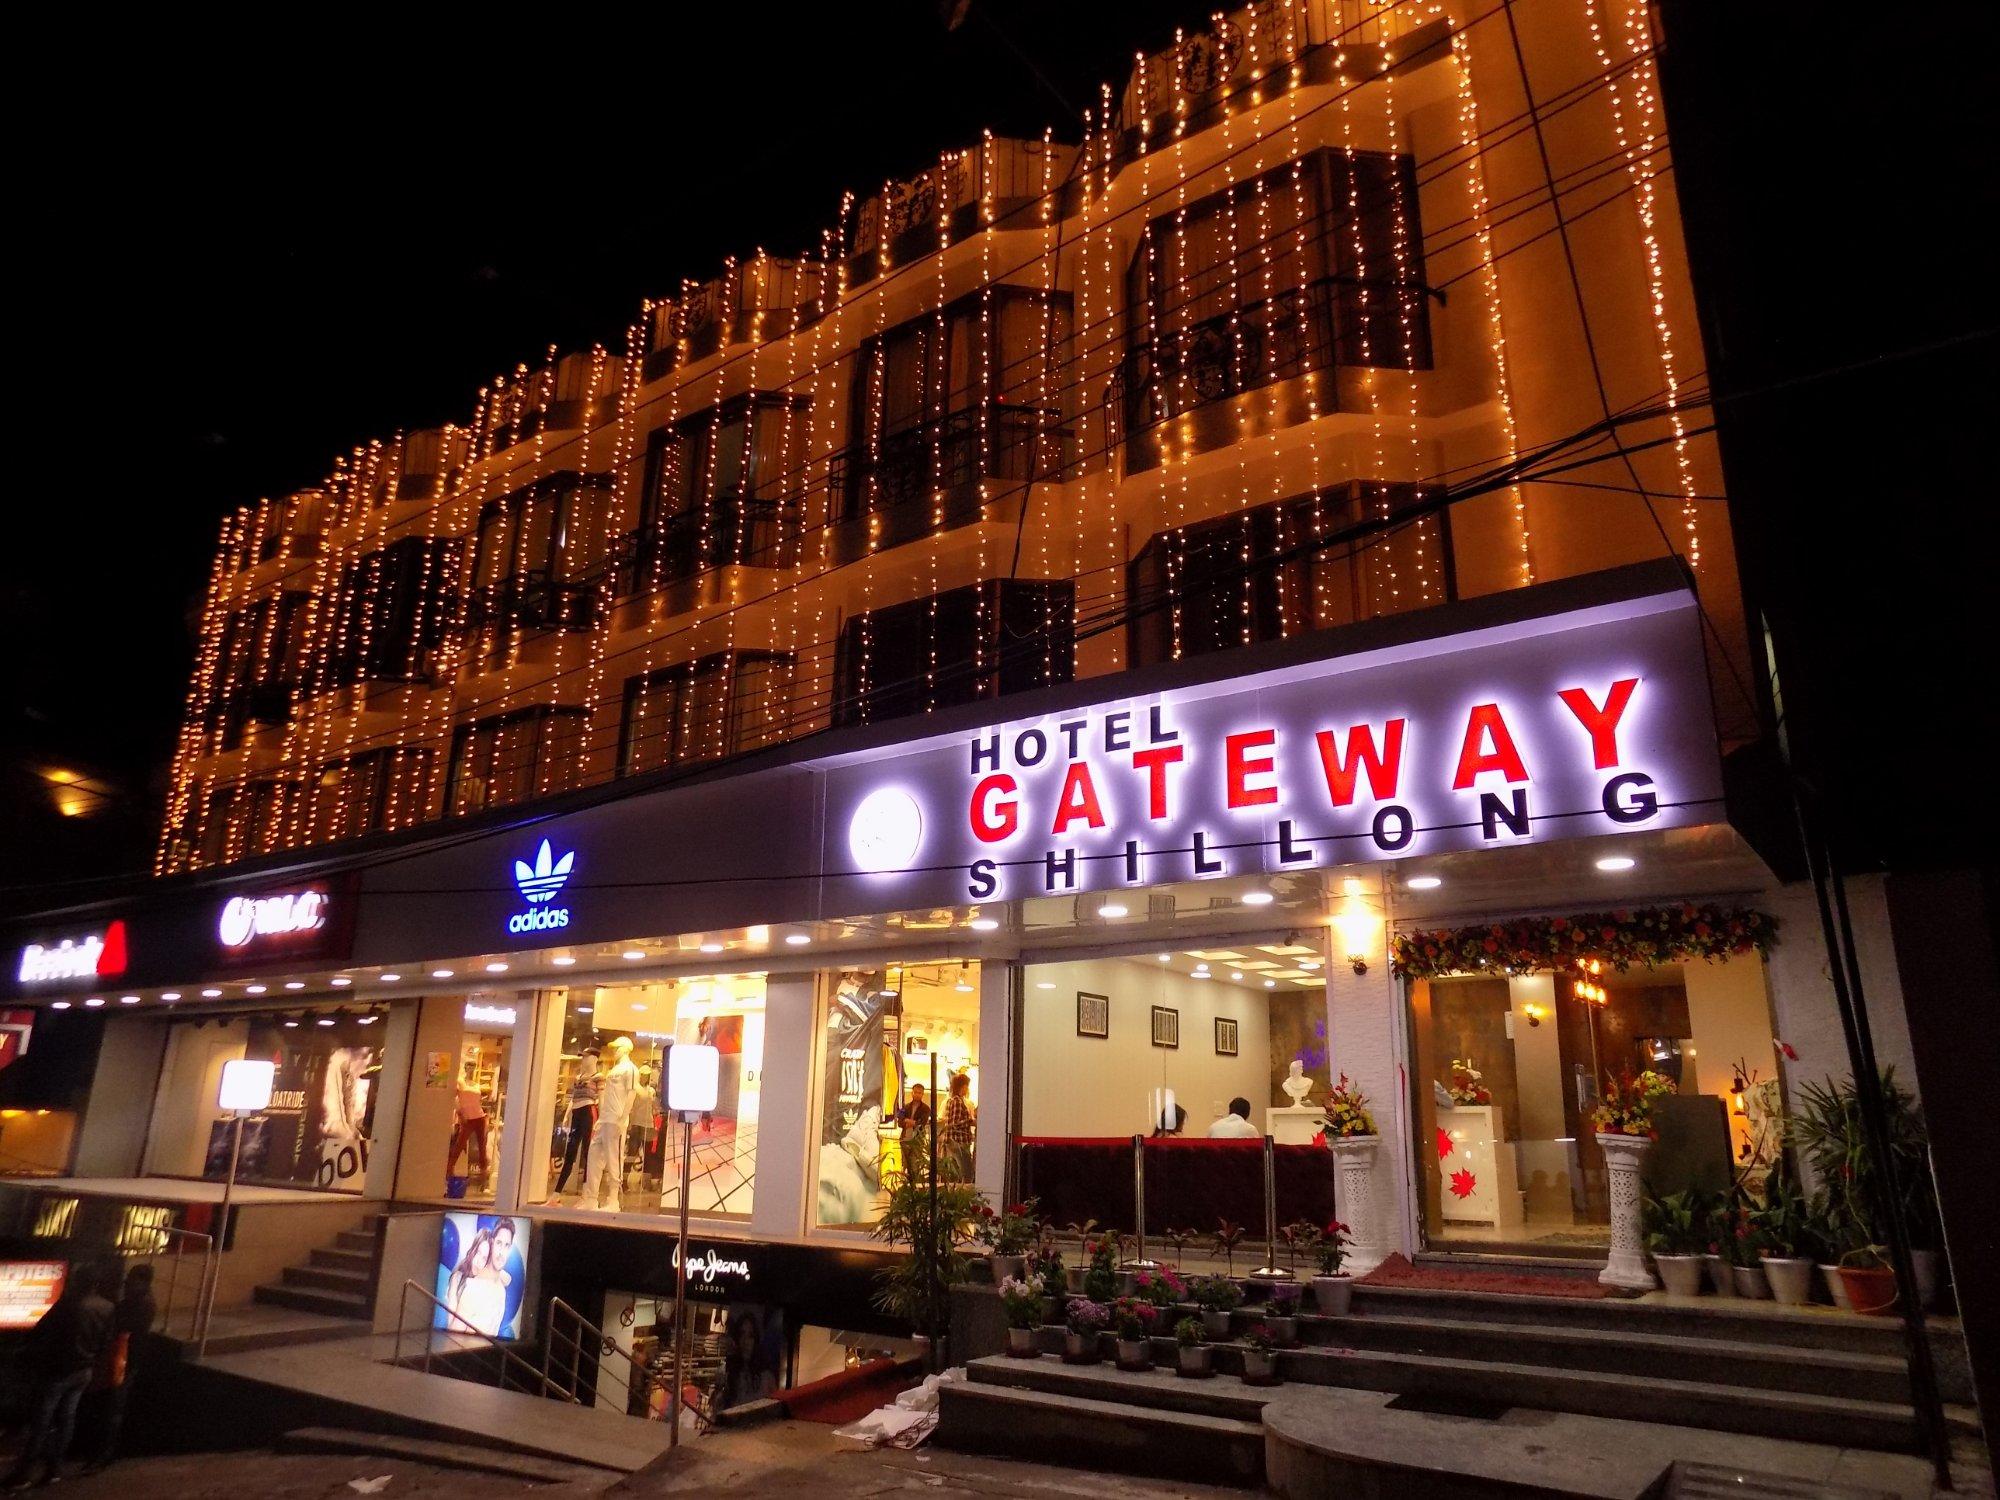 hotel-gateway-shillong.jpg